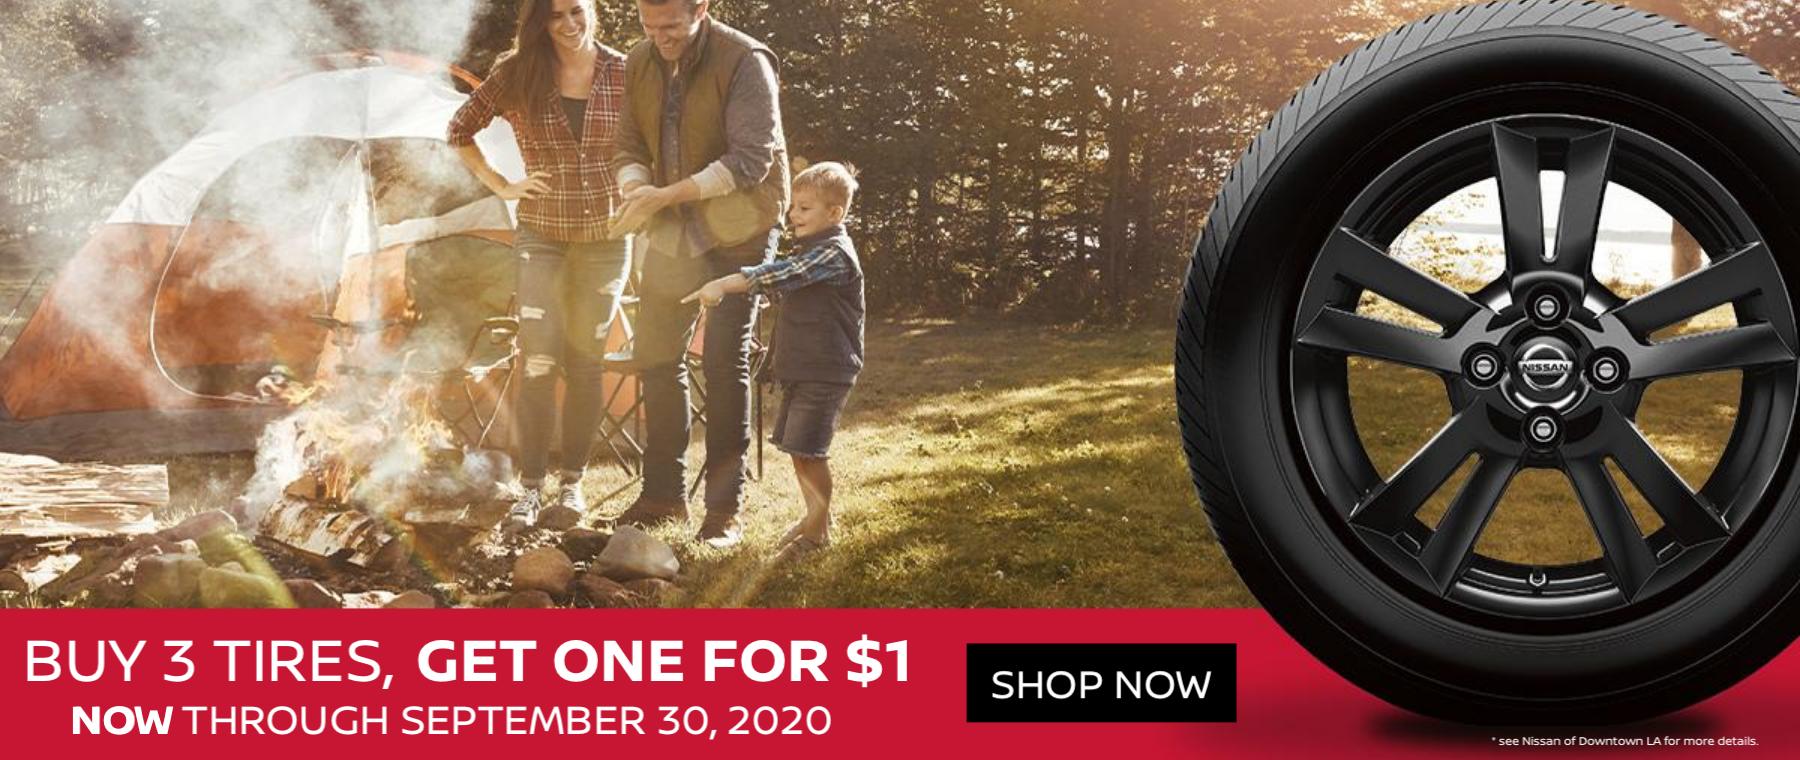 August / Sept Tire Special - BOGO $1